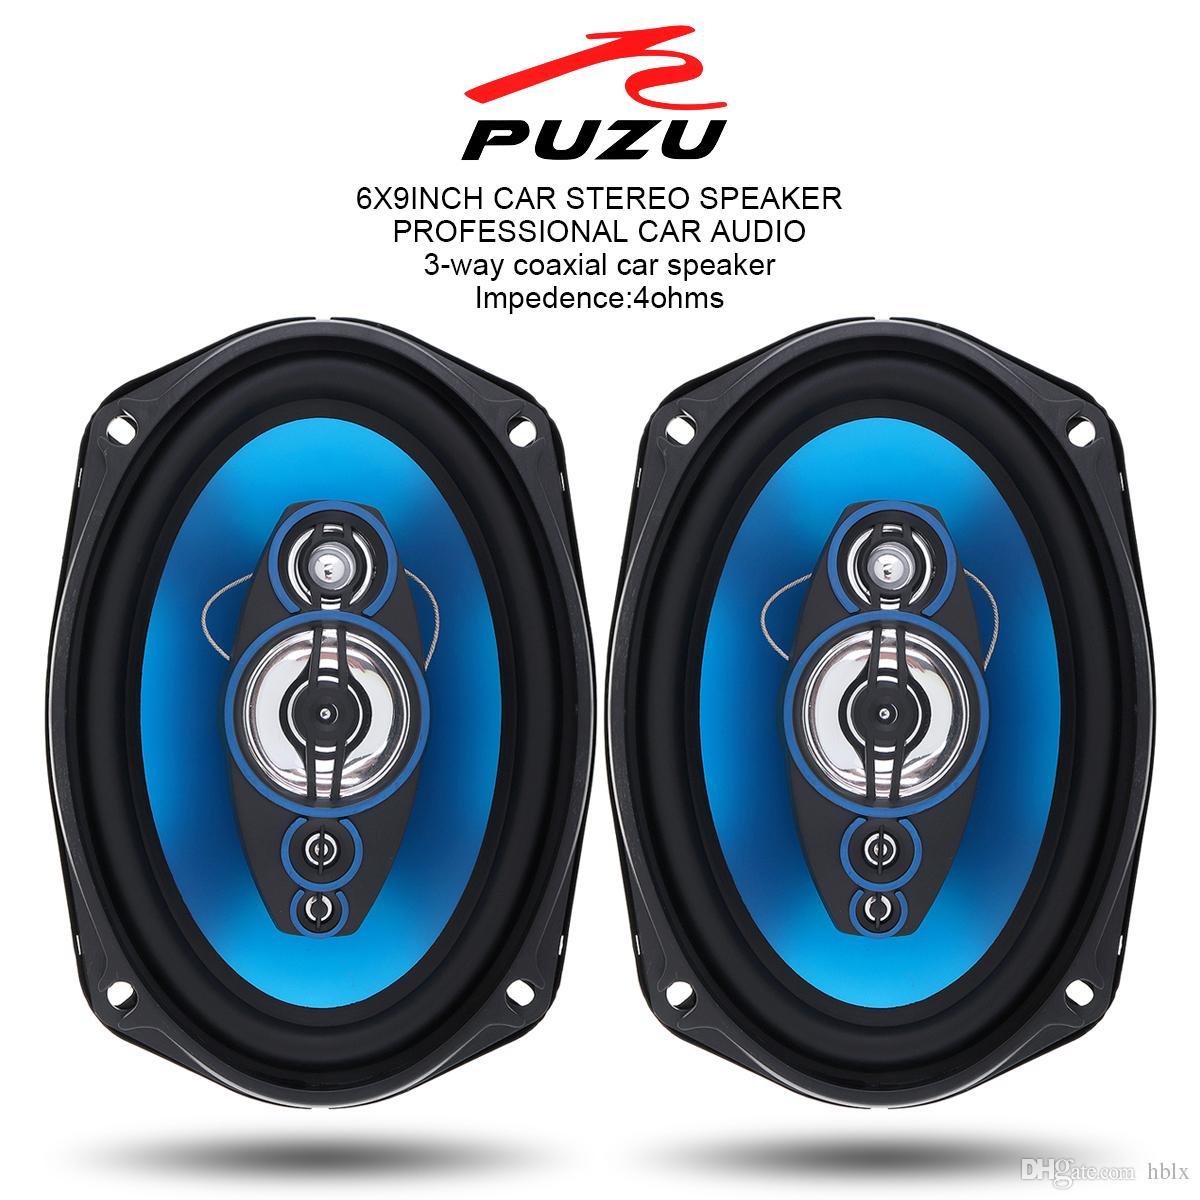 PZ 6962B 6x9 Inch 360W 3 Way Car Coaxial Auto Audio Music Stereo Full Range  Frequency Hifi Speakers CSA_00S Very Cheap Car Parts Where Can I Buy Cheap  Car ...